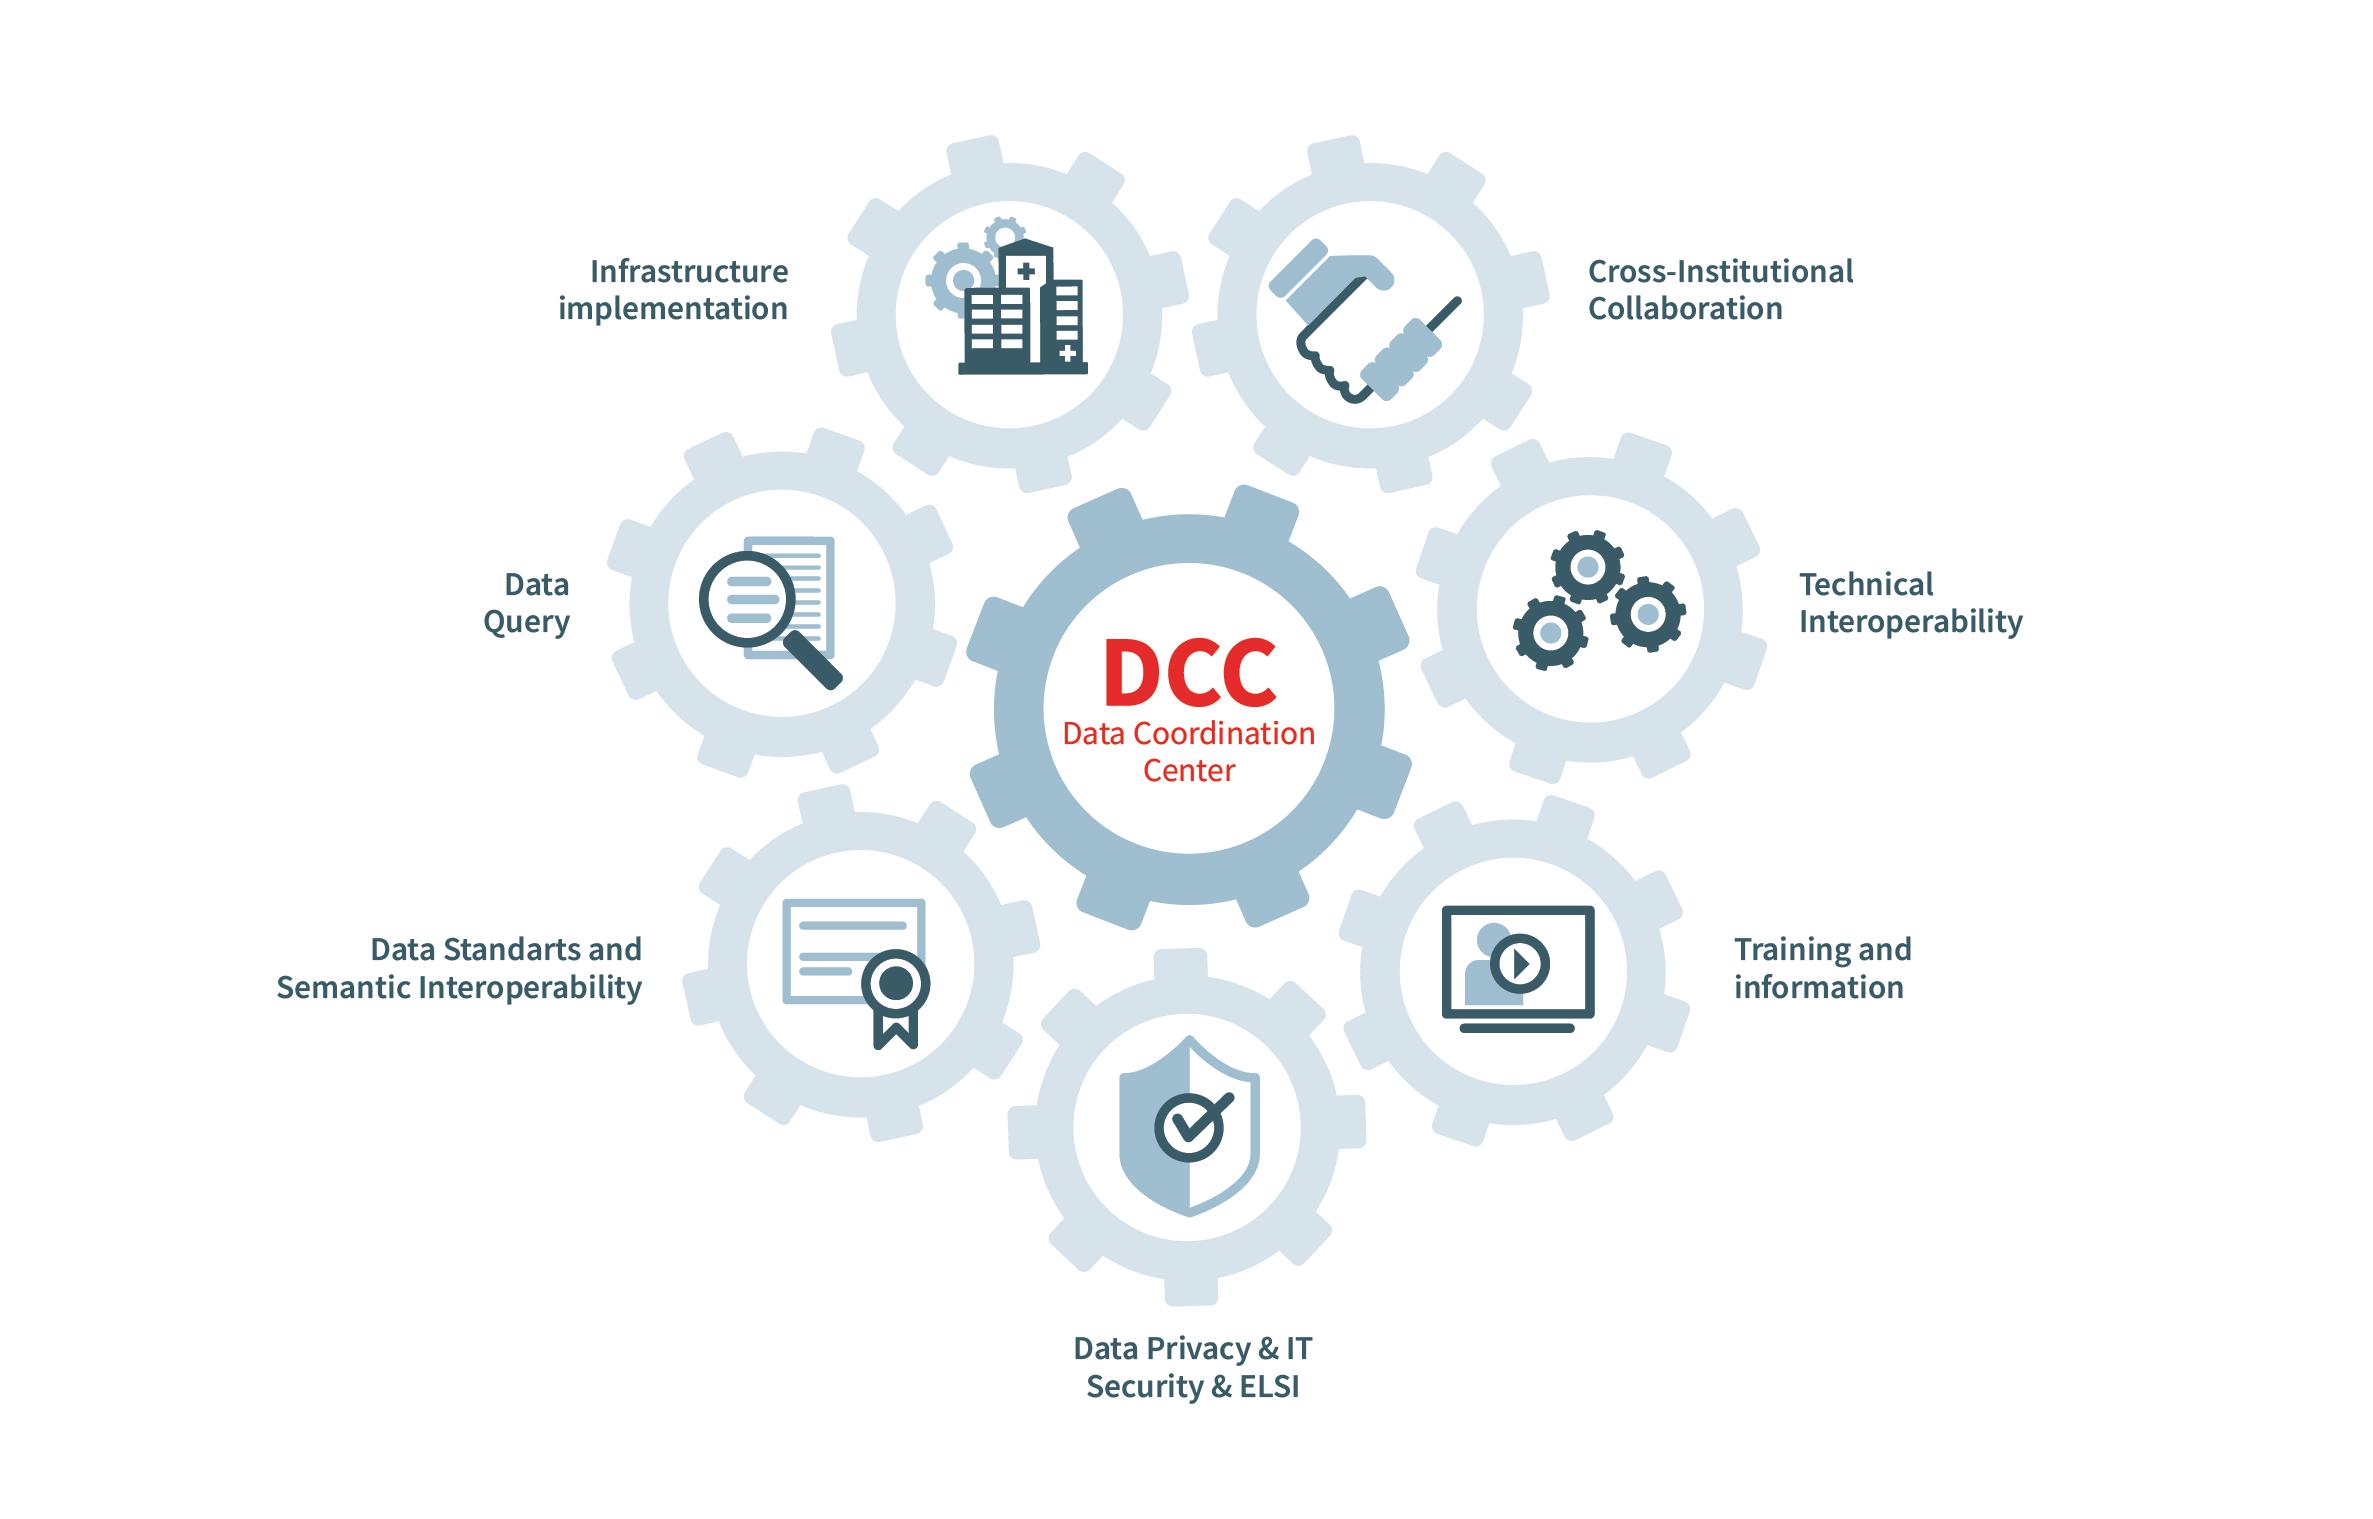 DCC Service Portfolio